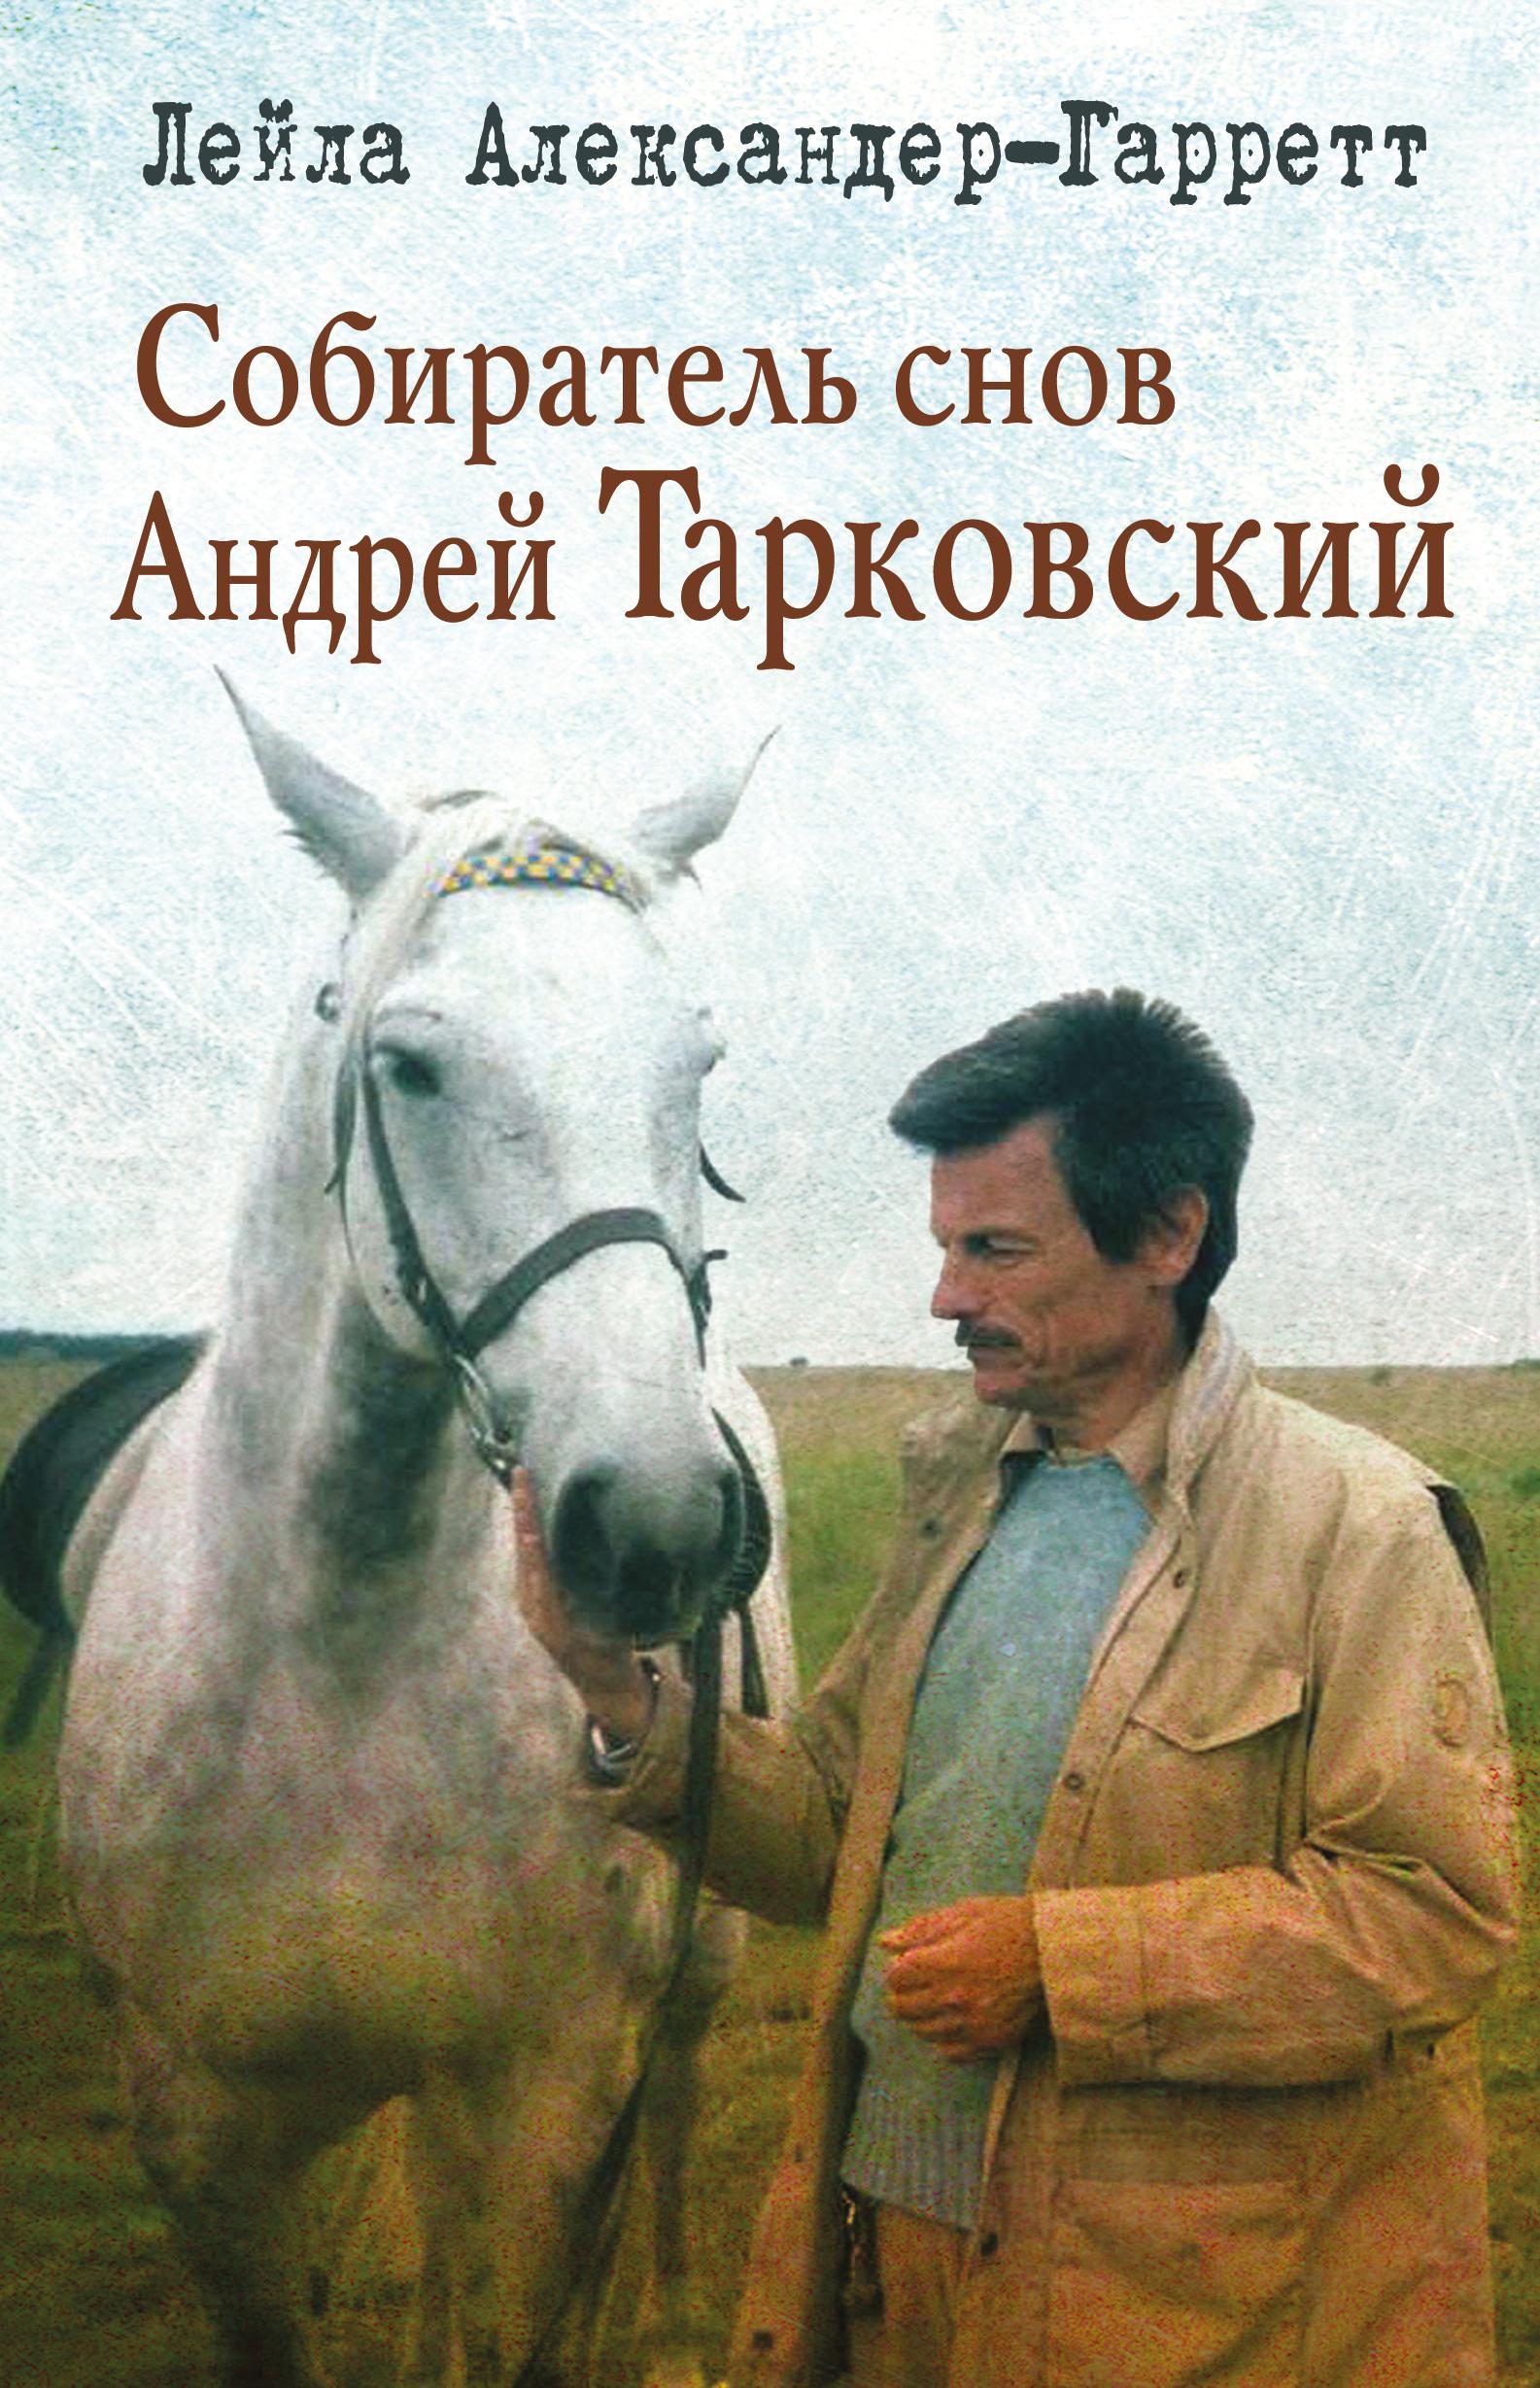 Александер-Гарретт Лейла Собиратель снов Андрей Тарковский